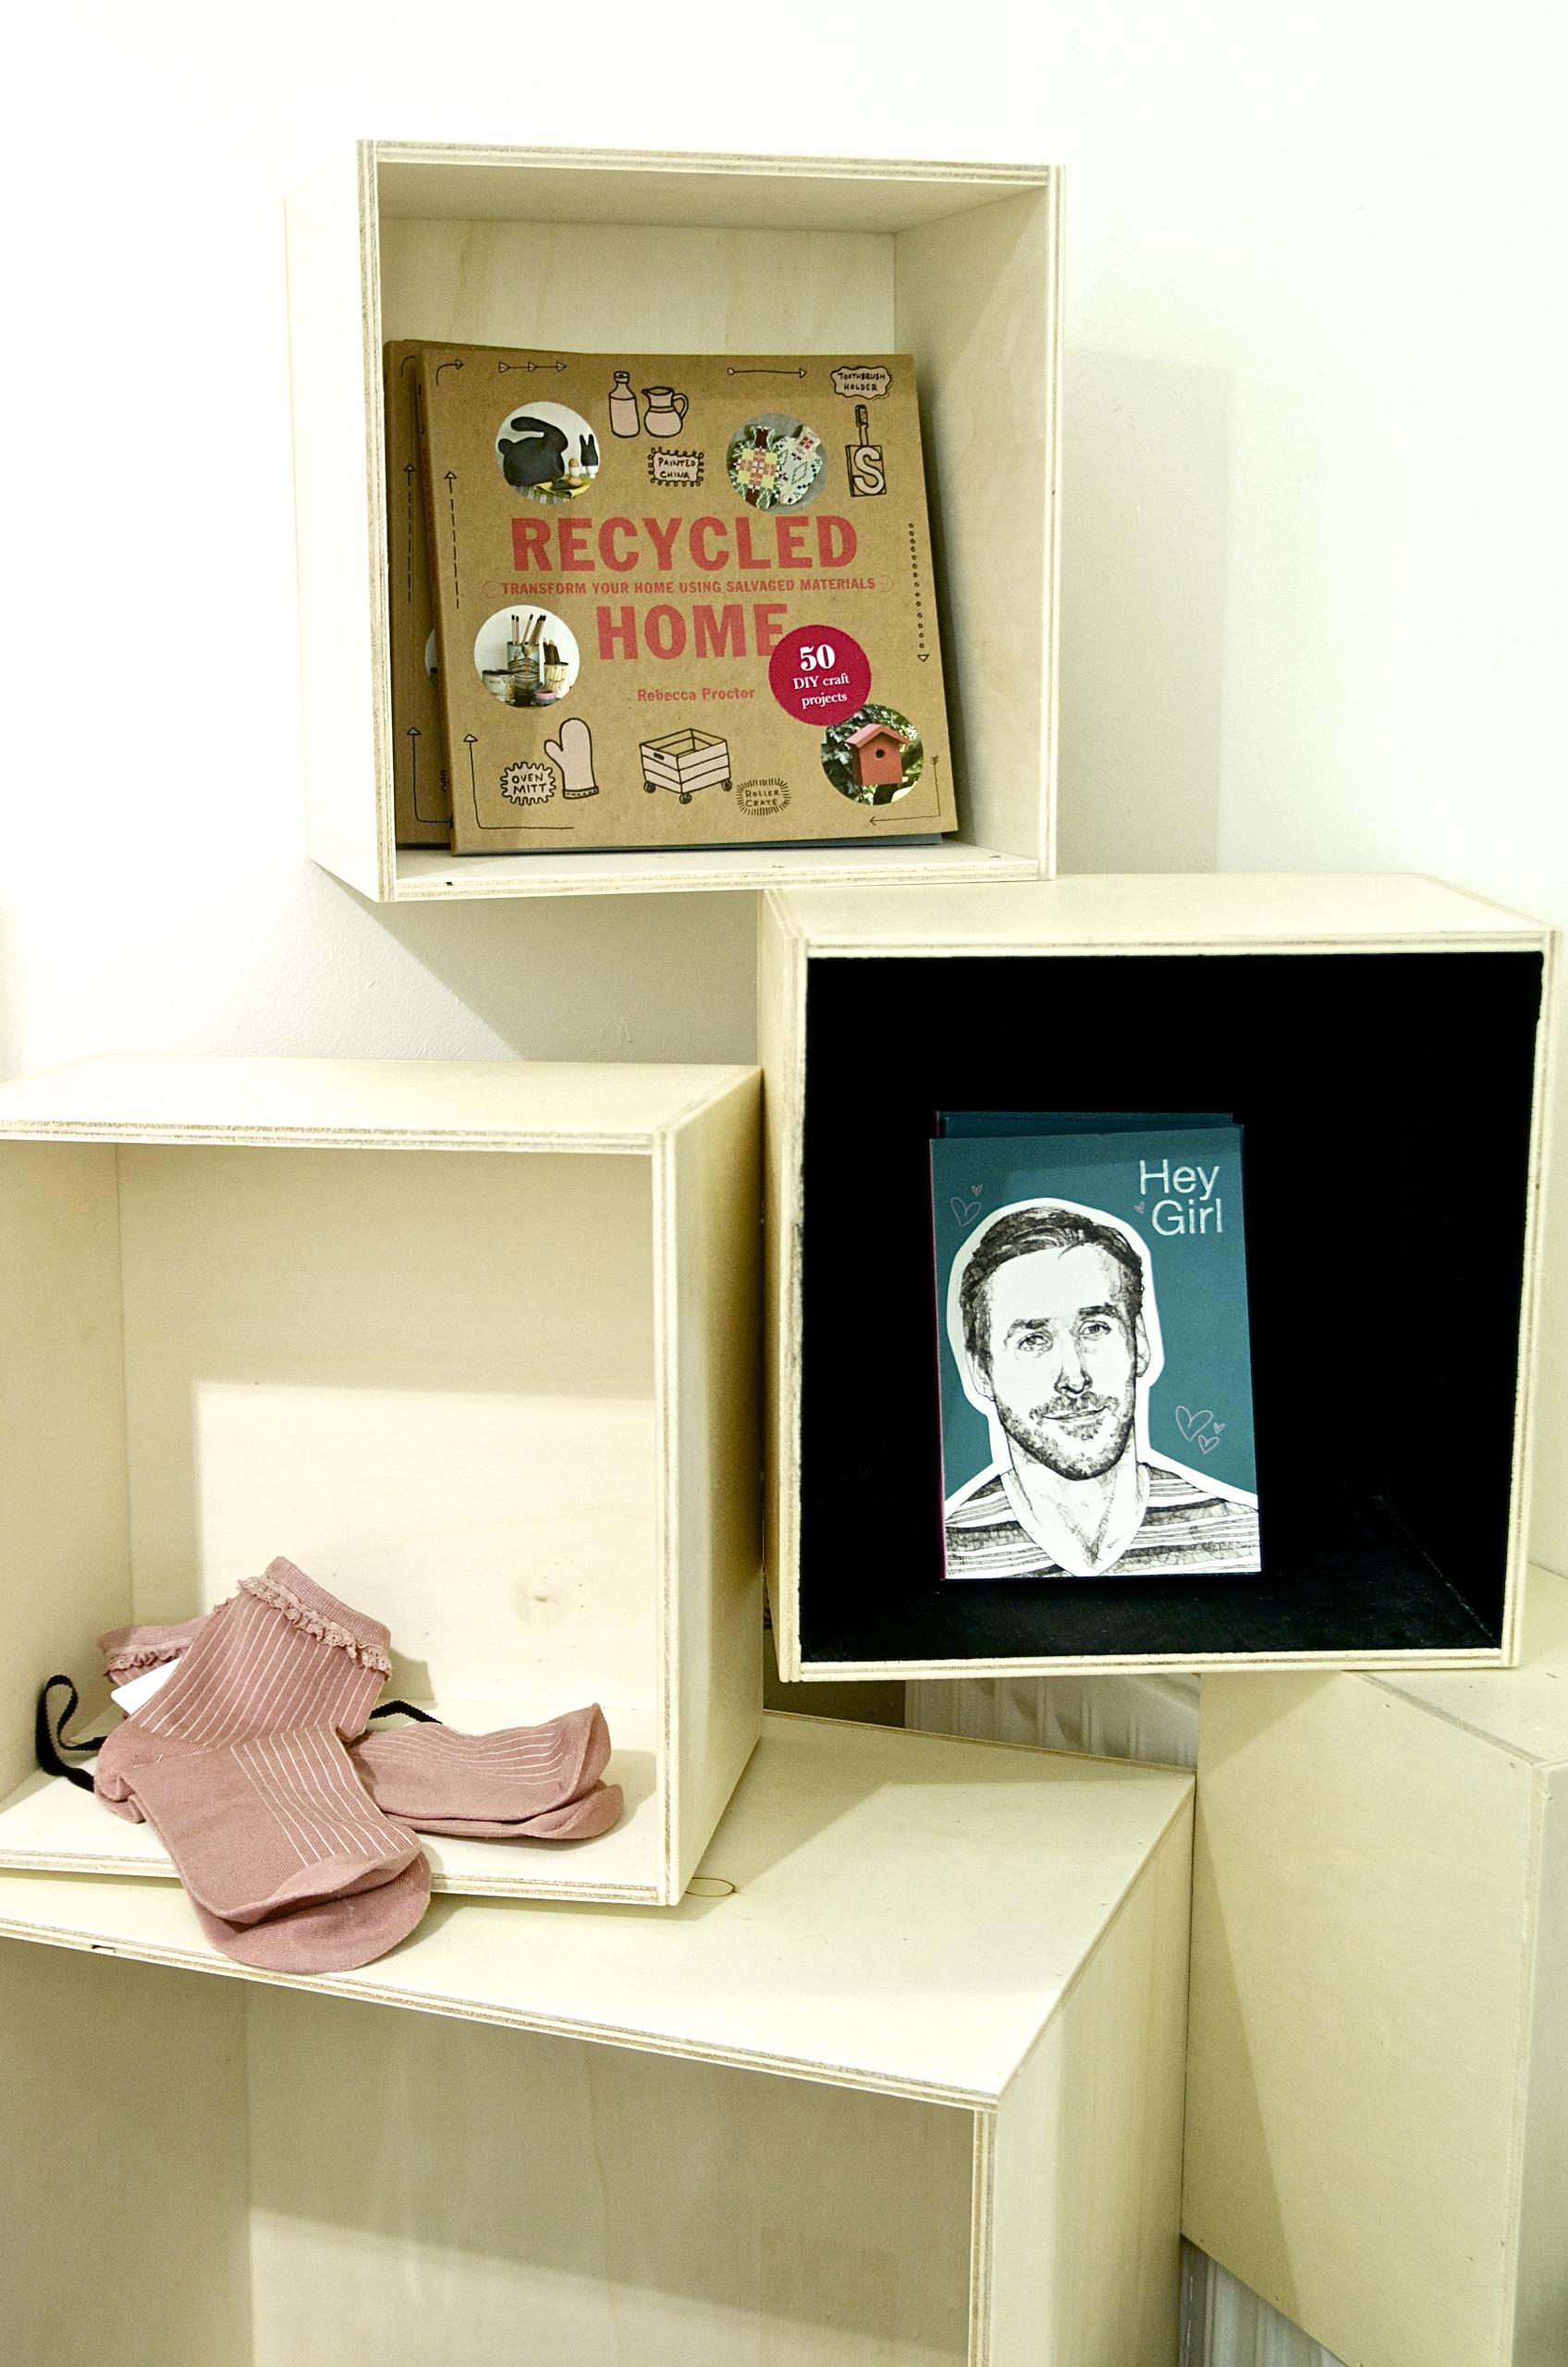 Holzregale, Bücher, Ryan Gosling